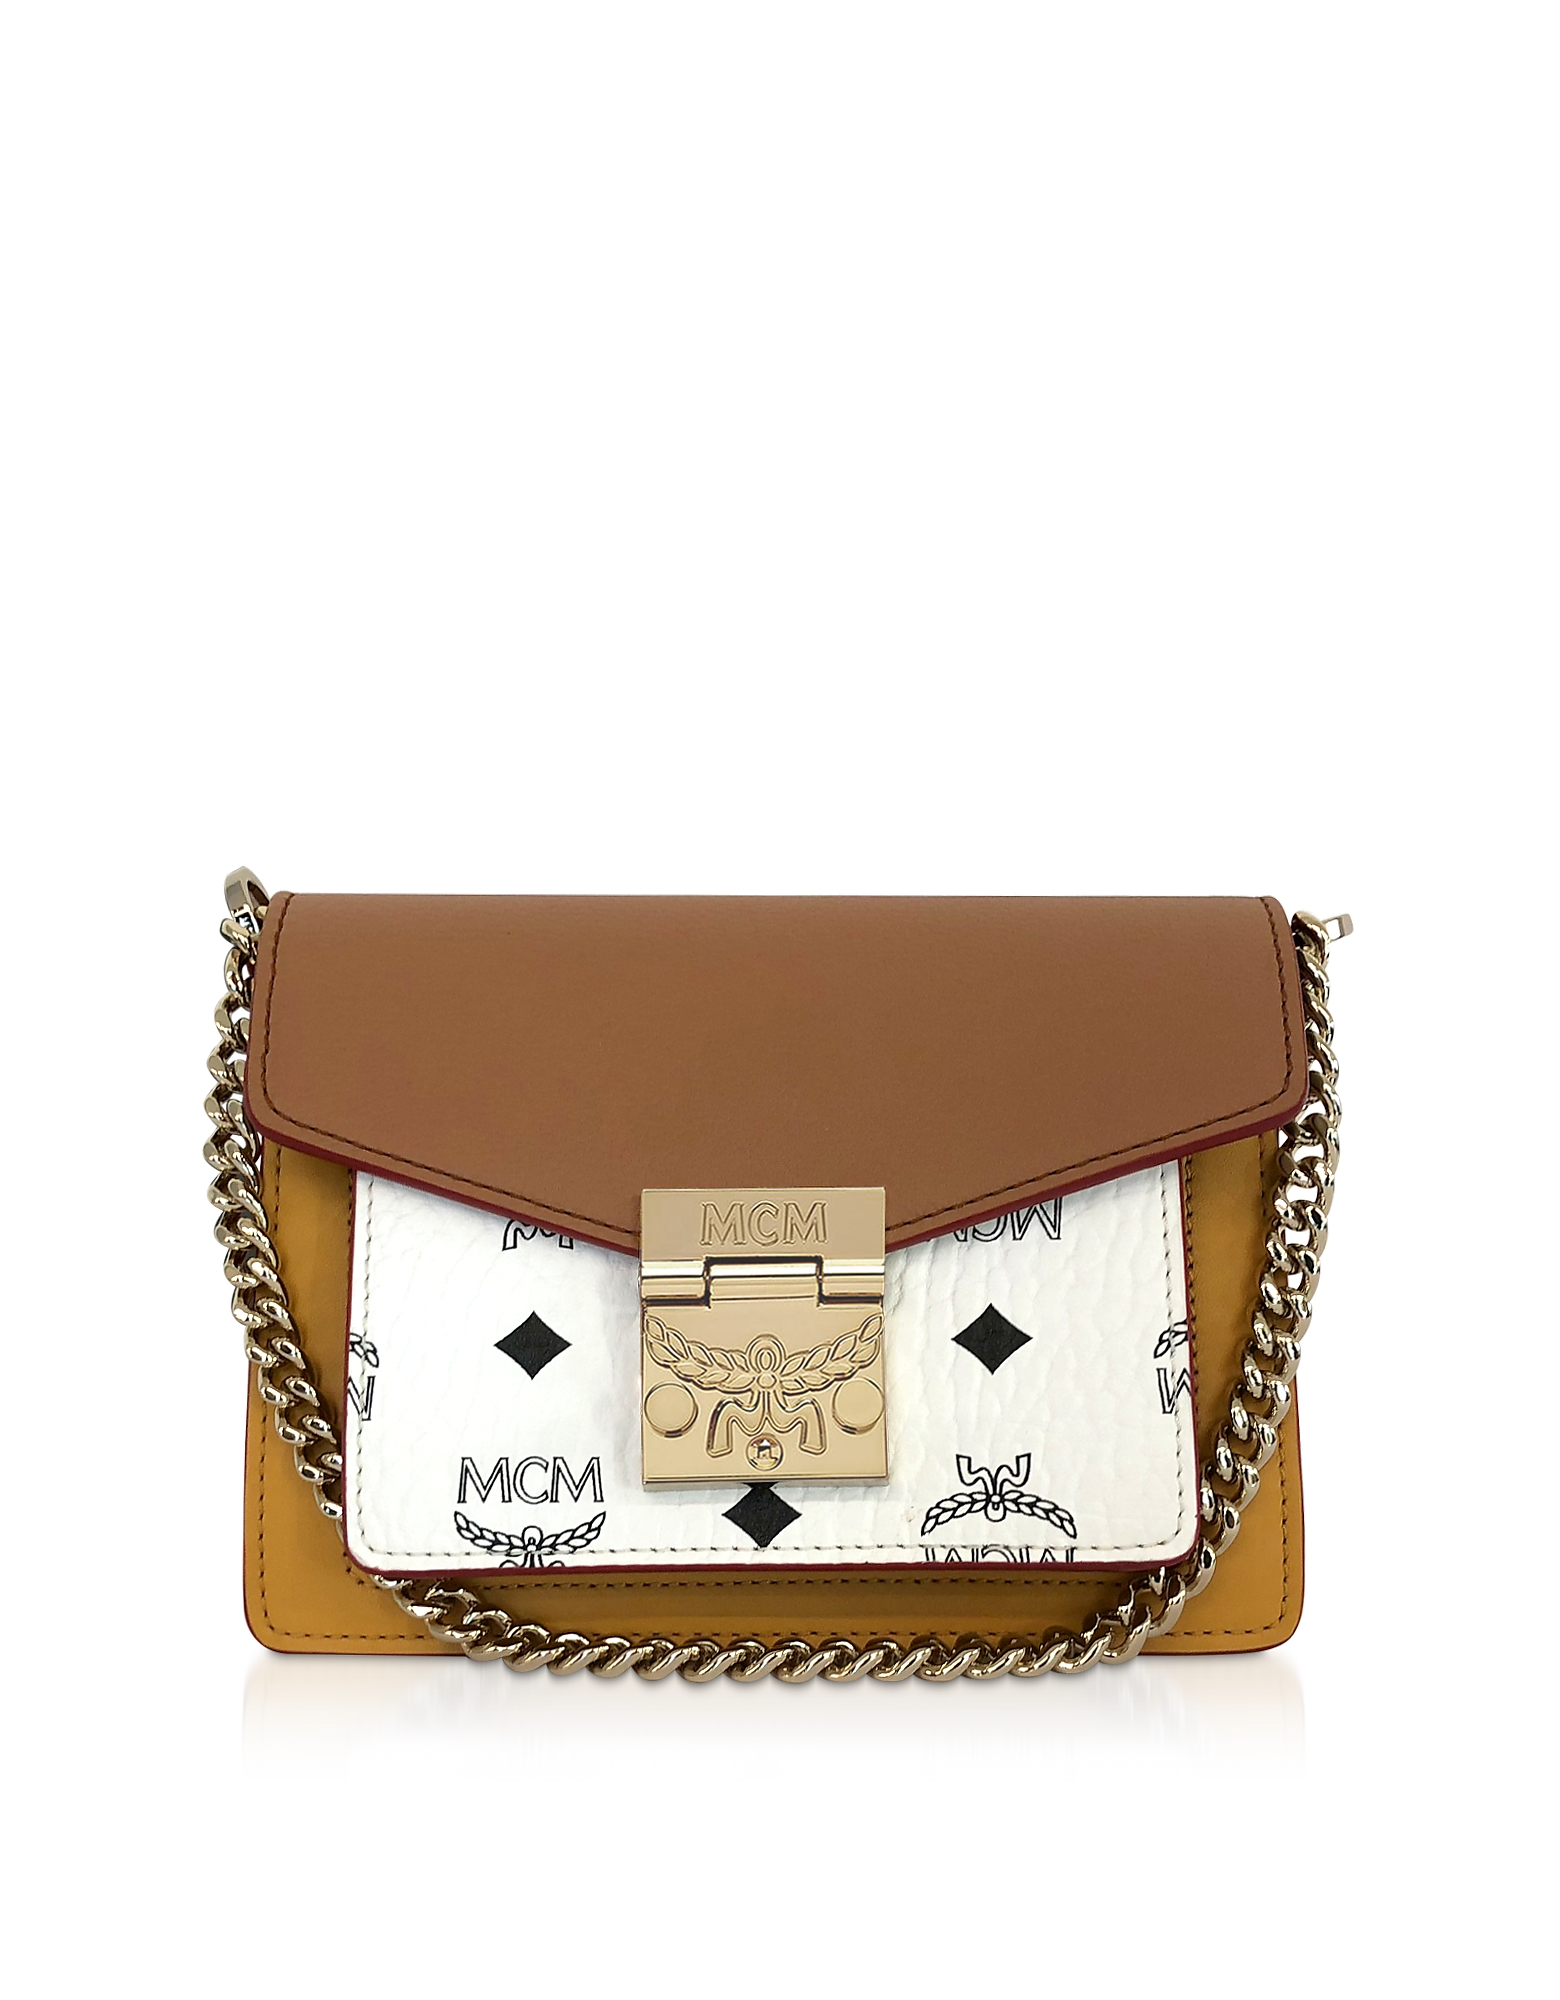 96342fae4 Mcm Patricia Visetos Leather Block Mini Crossbody Bag   ModeSens